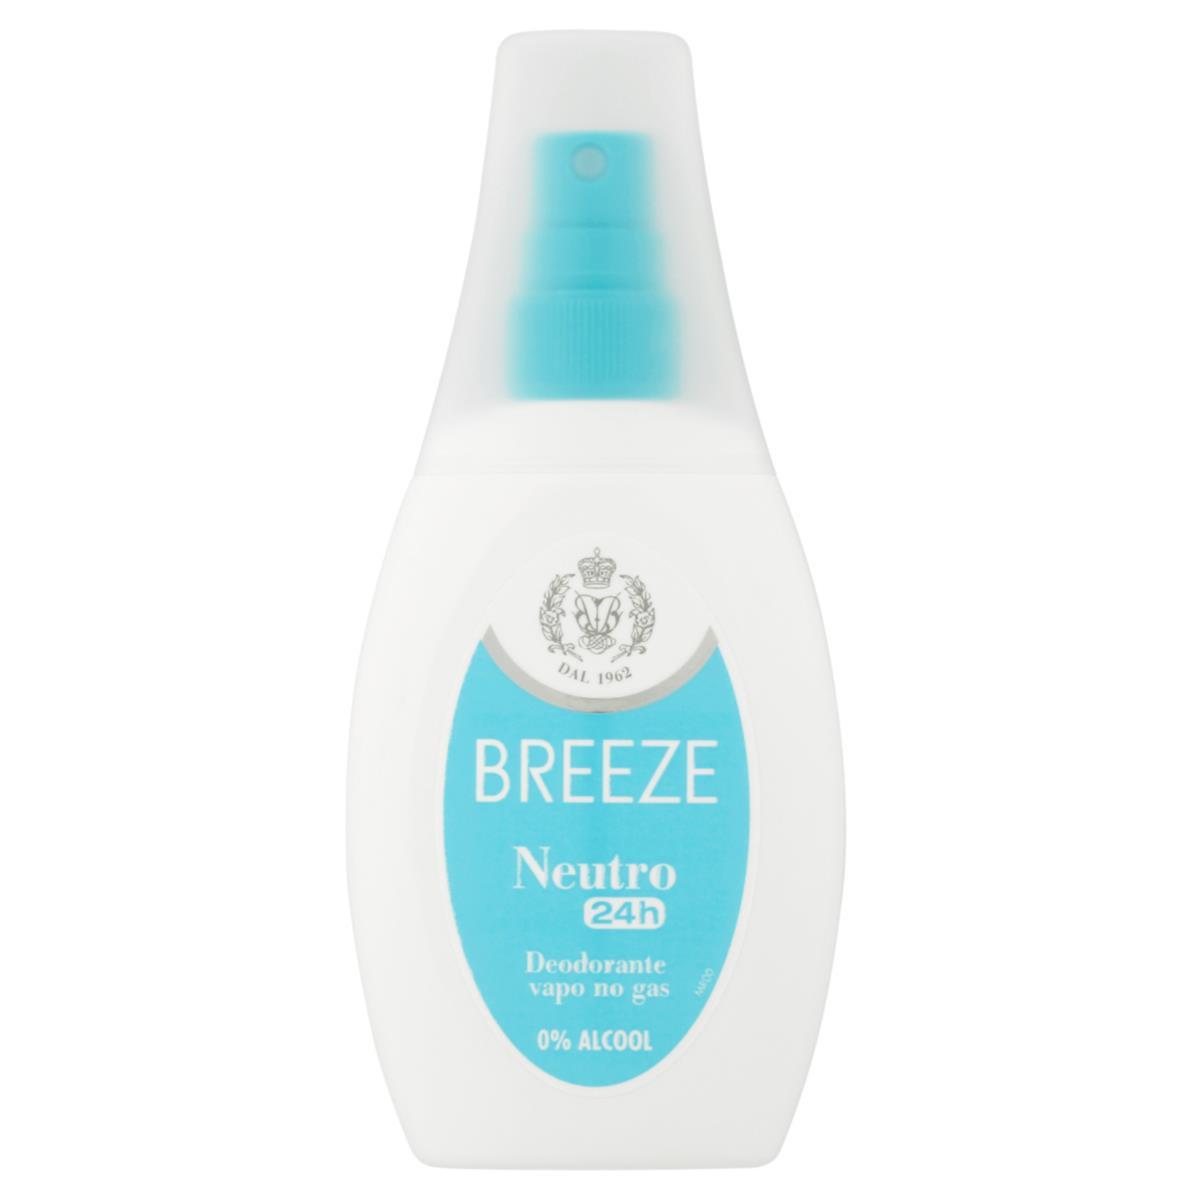 Deodorante Breeze Neutro Vapo 75ml